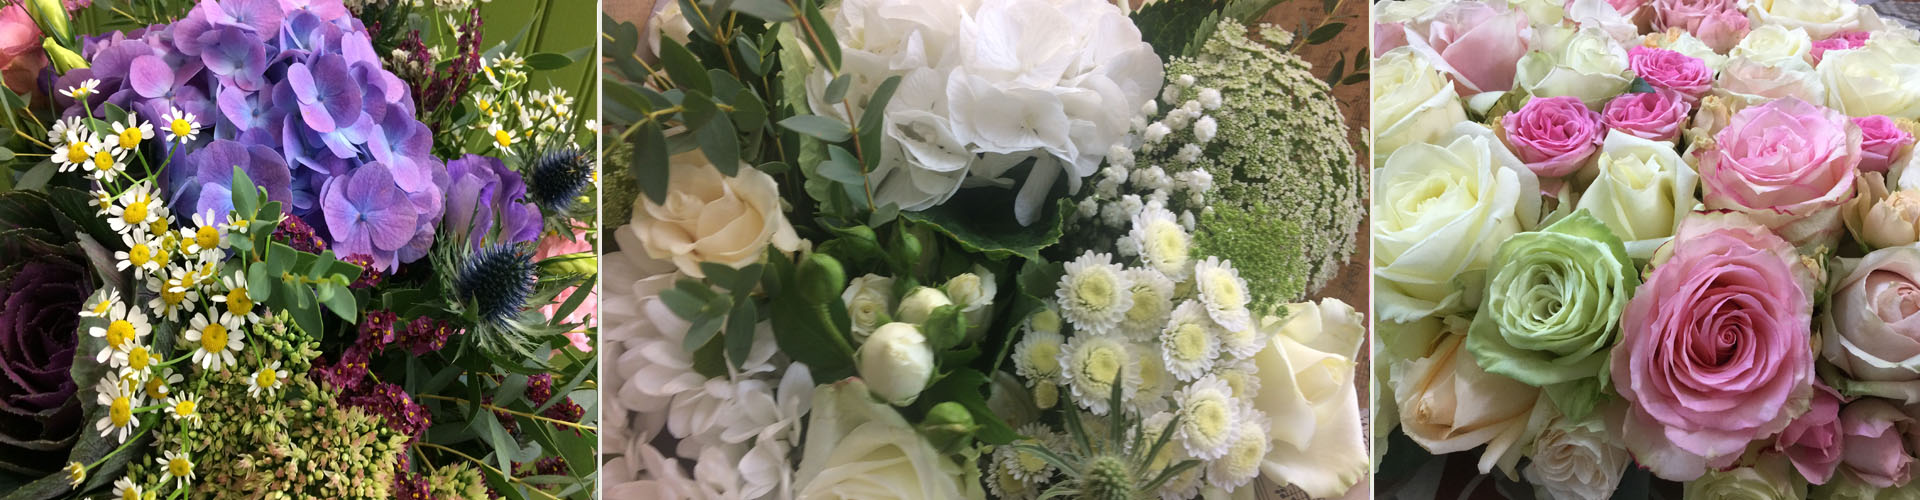 Artisan fleuriste Pélissanne, 13